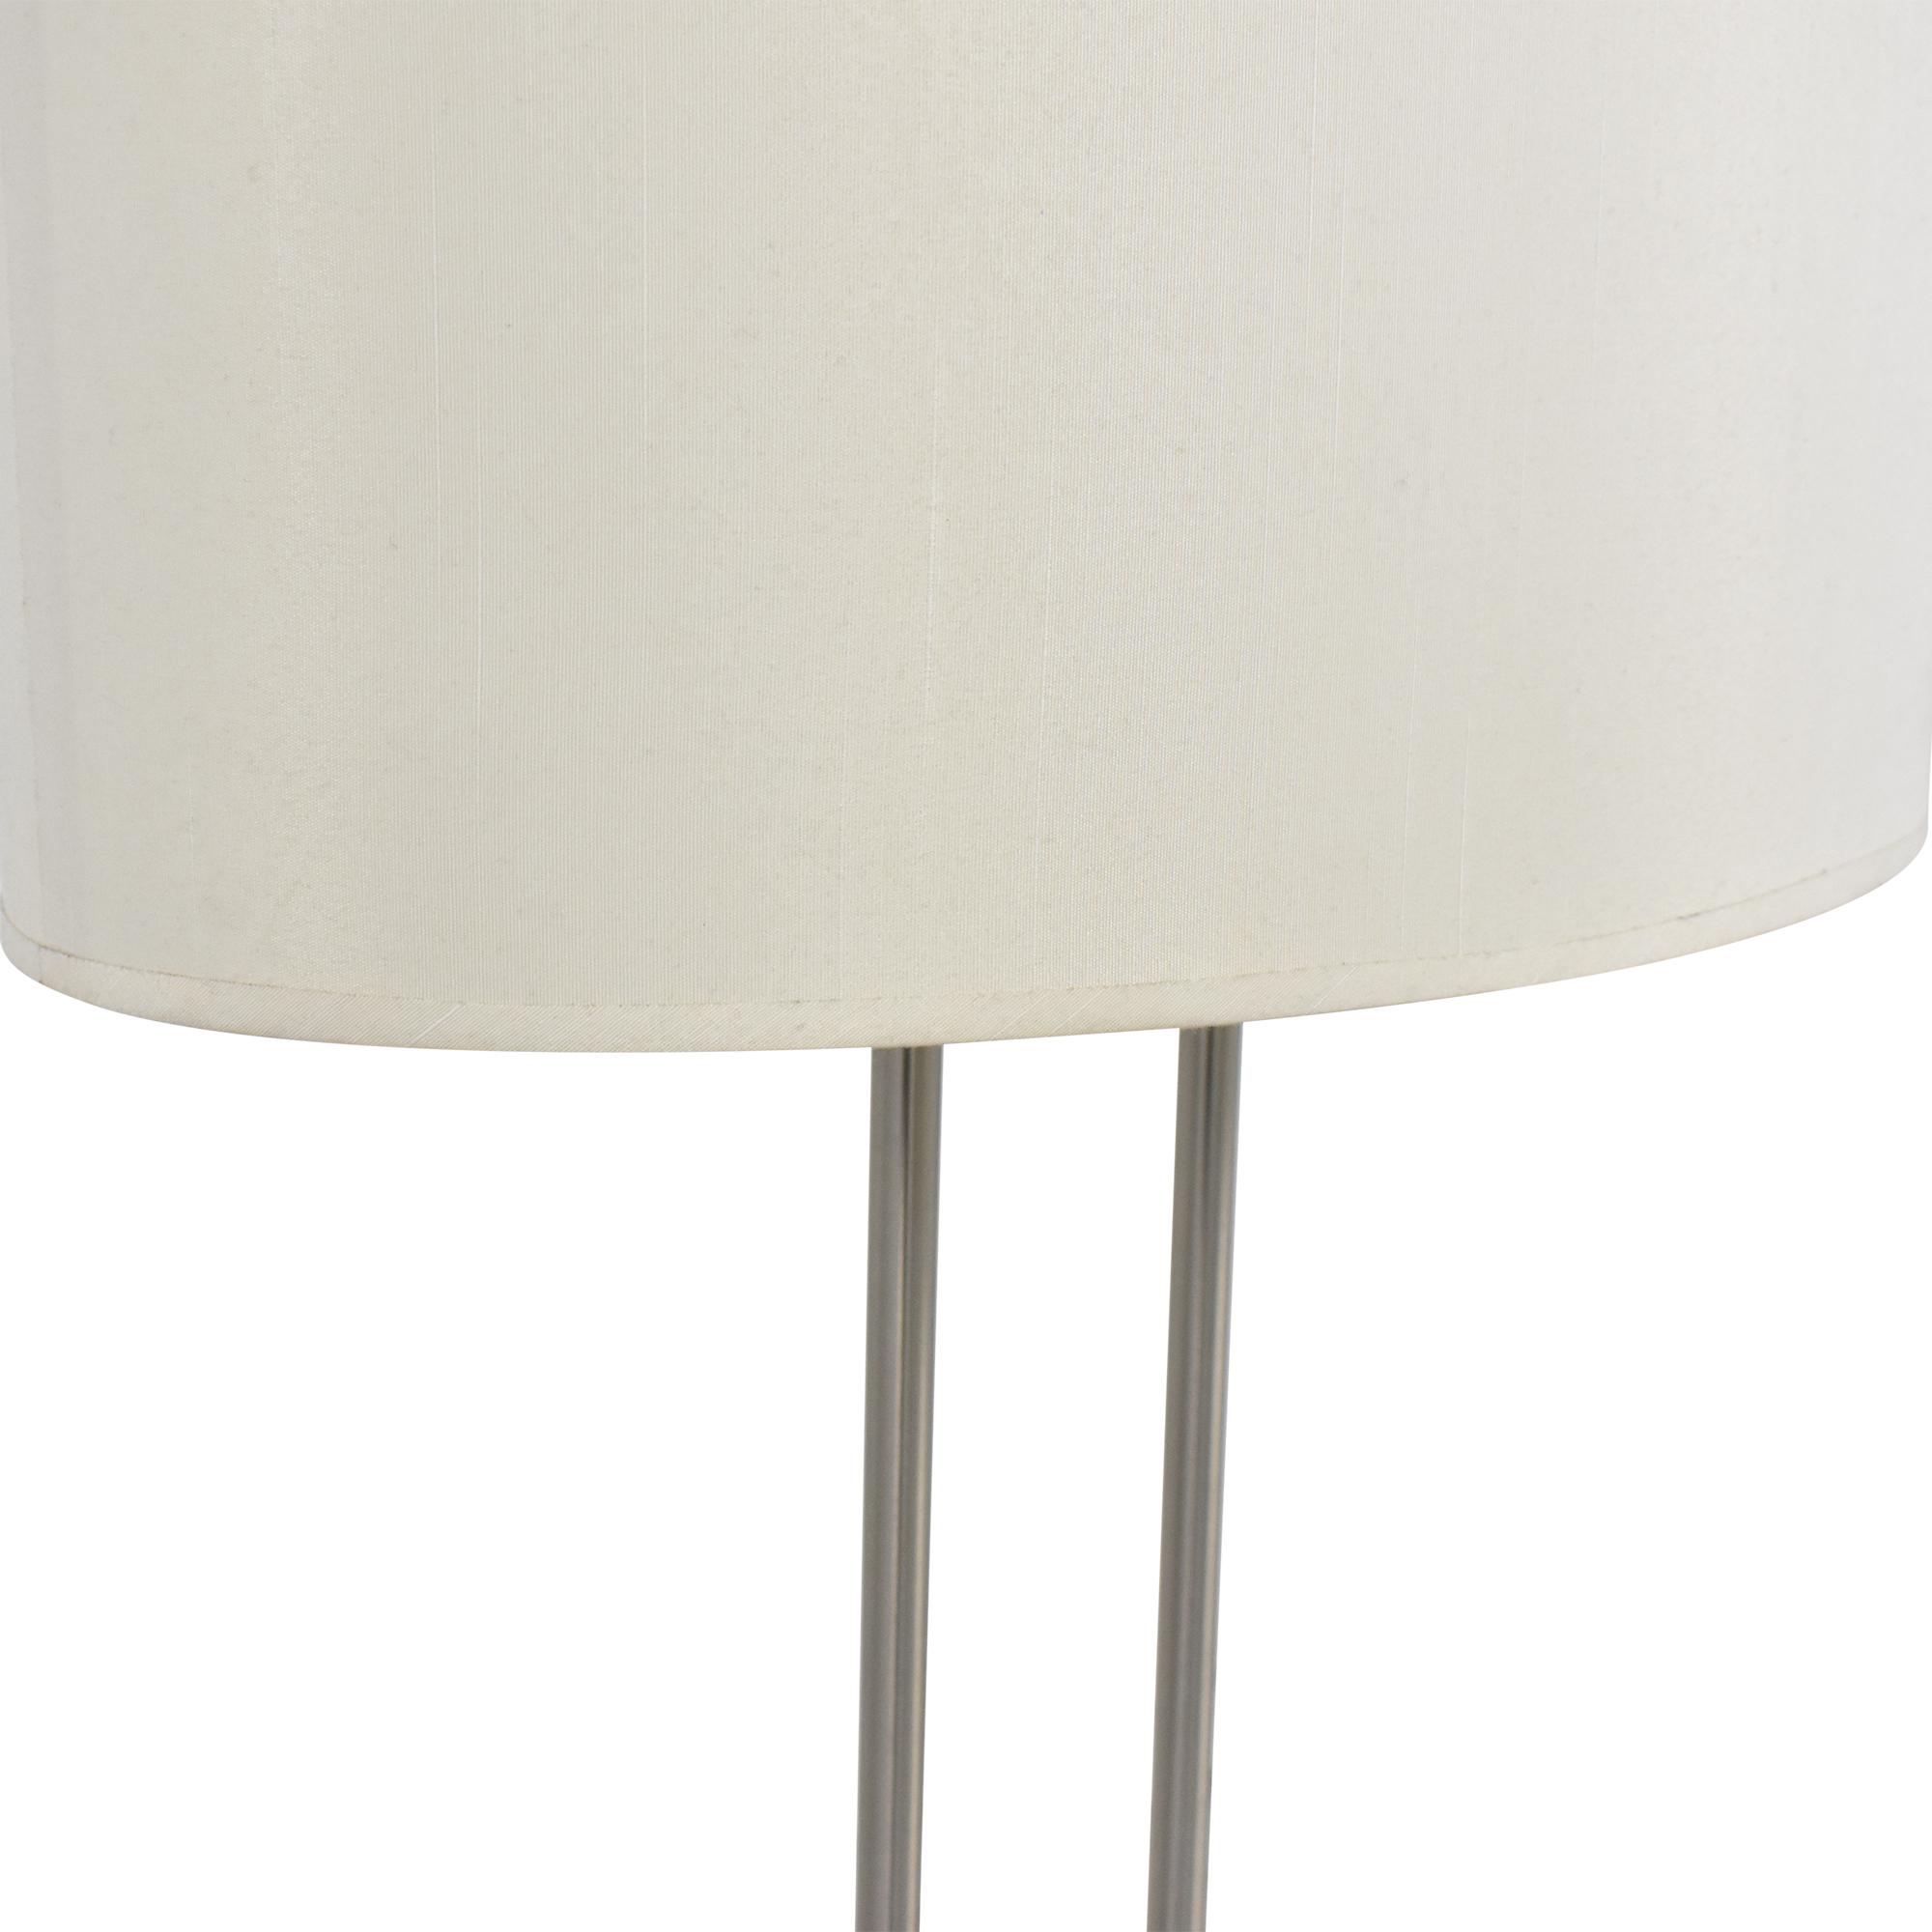 Parallel Bars Floor Lamp Lamps